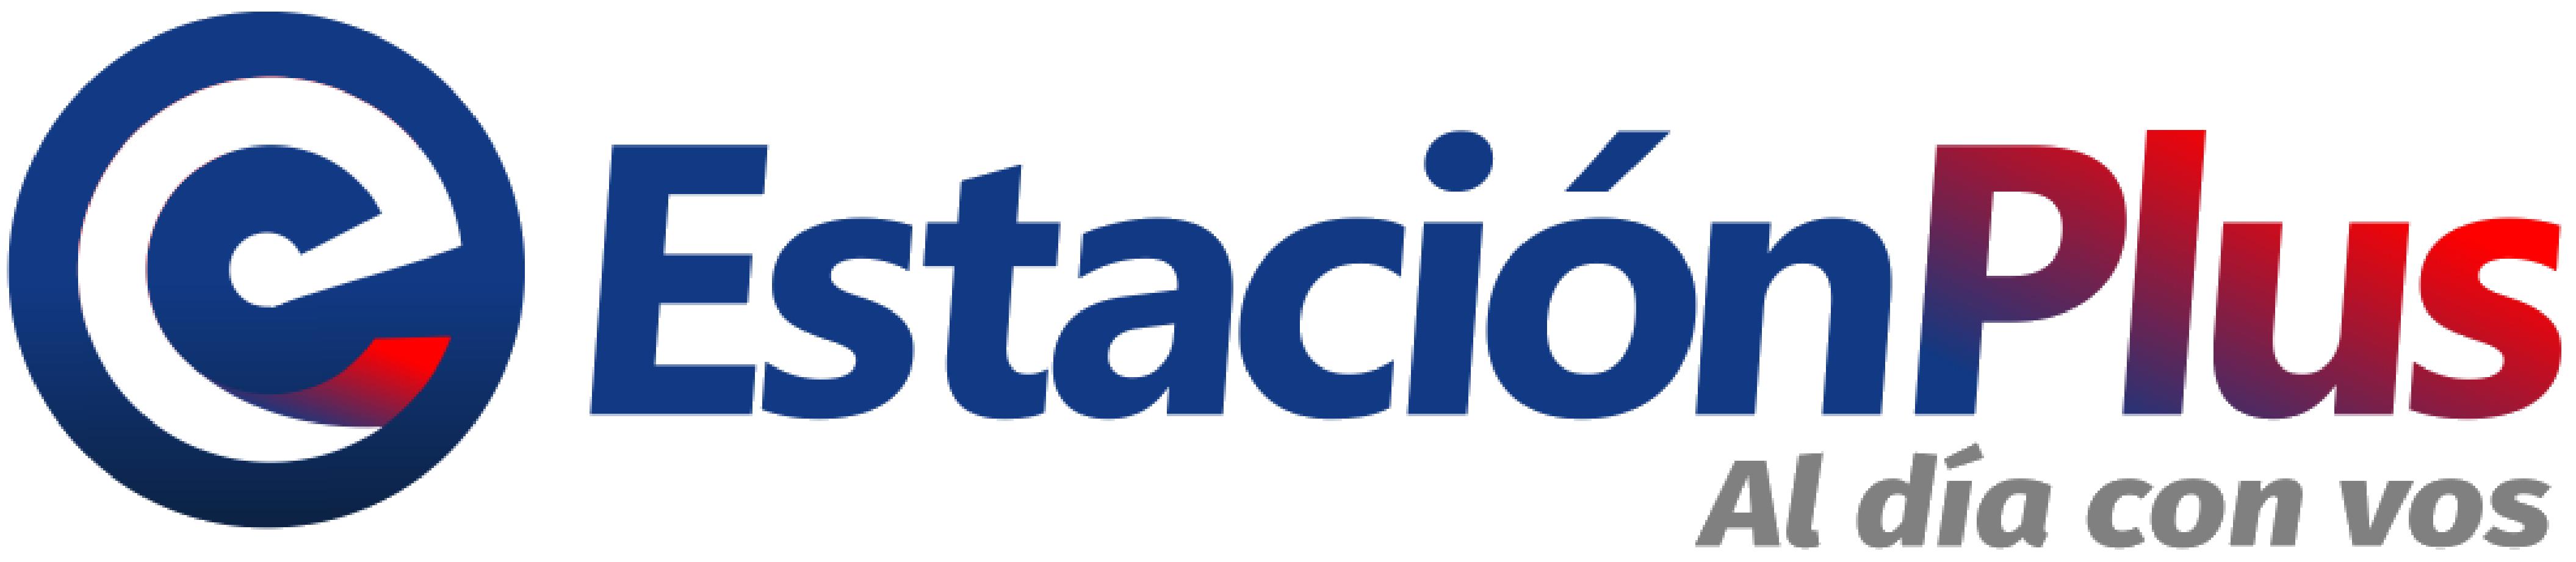 Estación Plus Noticias - Crespo